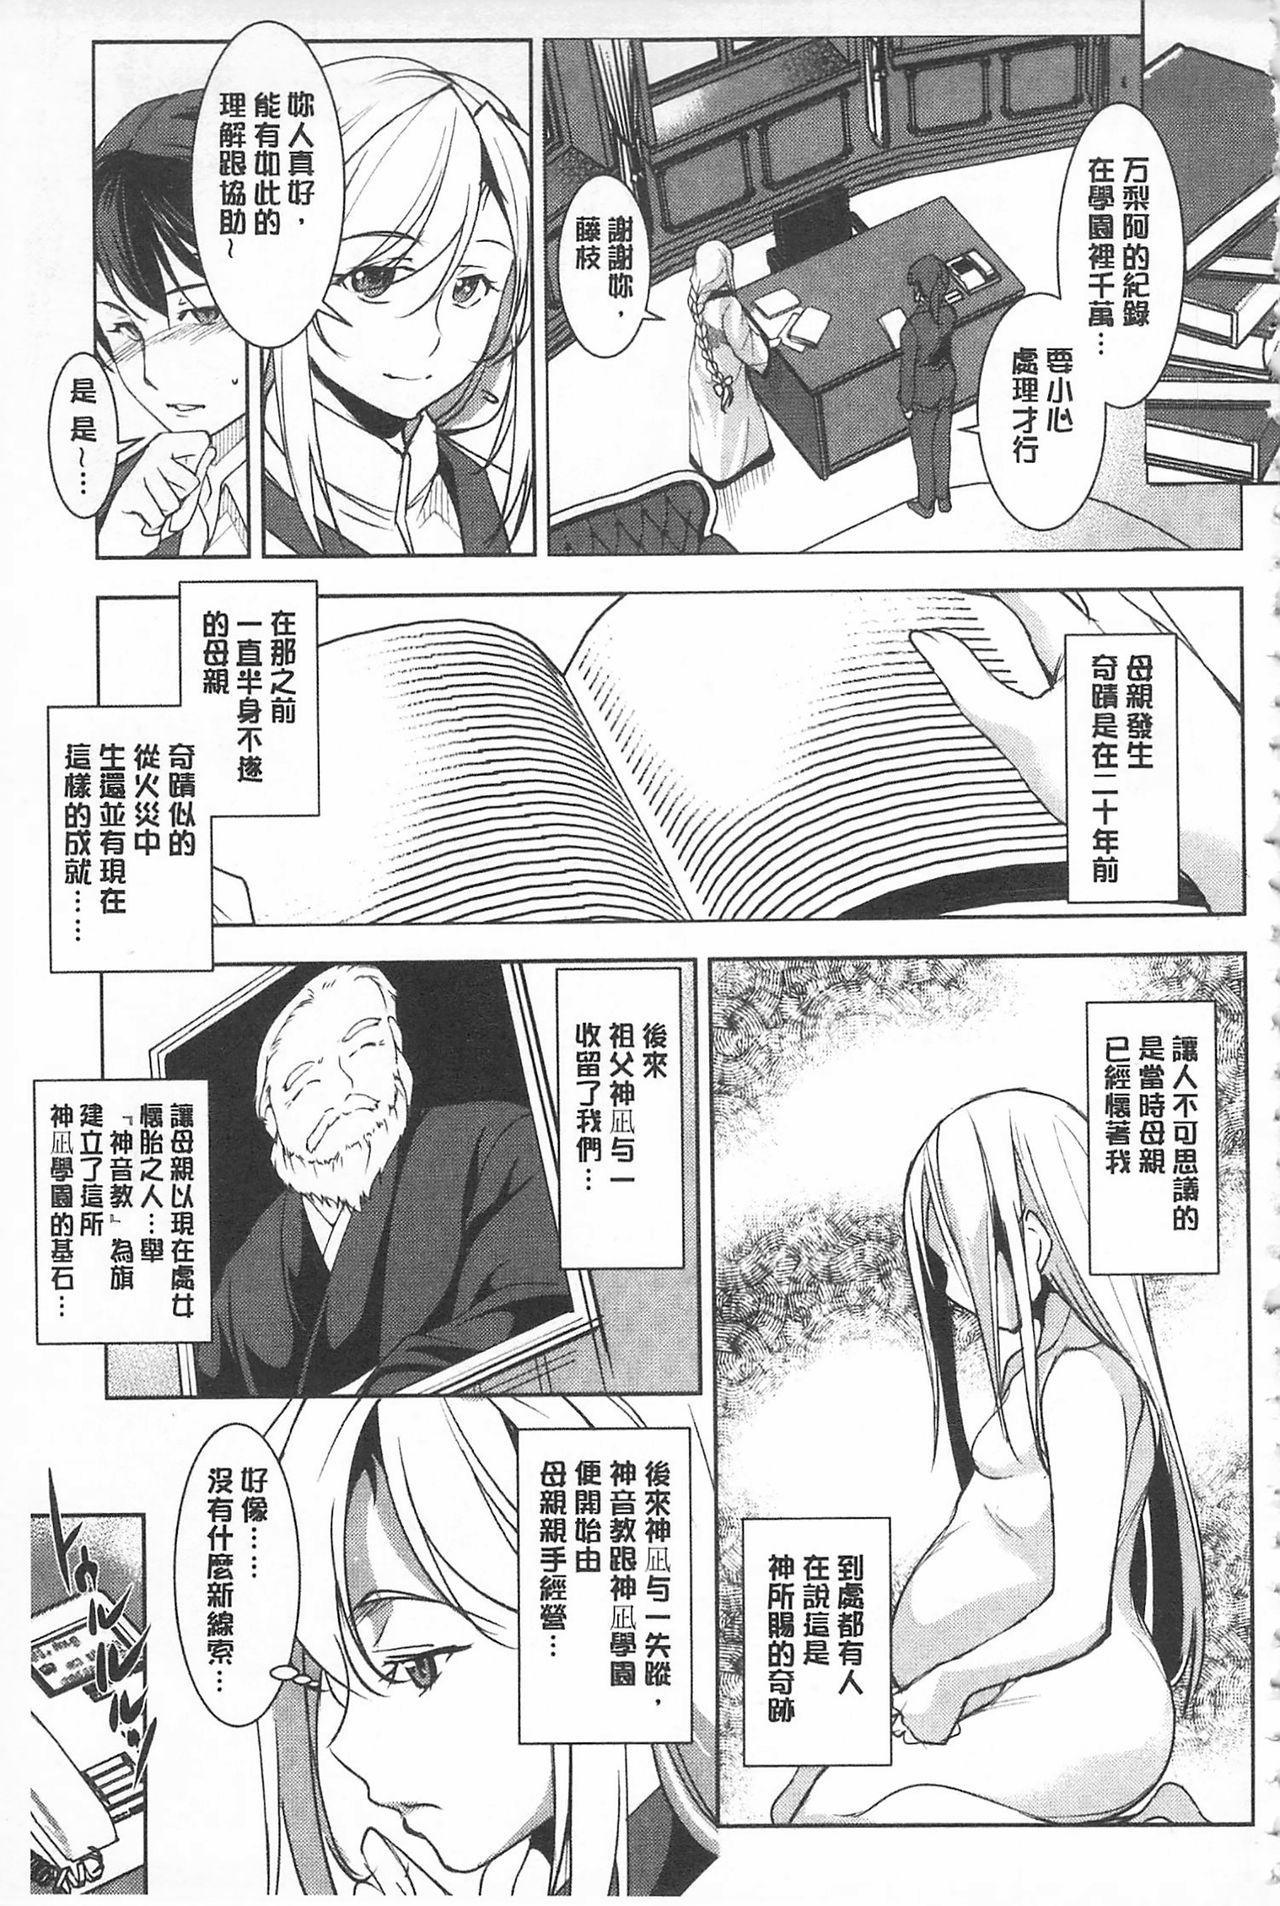 [Amano Kazumi] Seida Inyou -Seijo no Katachi Shita Intou- | 聖墮陰陽 -聖女的容貌與淫蕩- [Chinese] 94